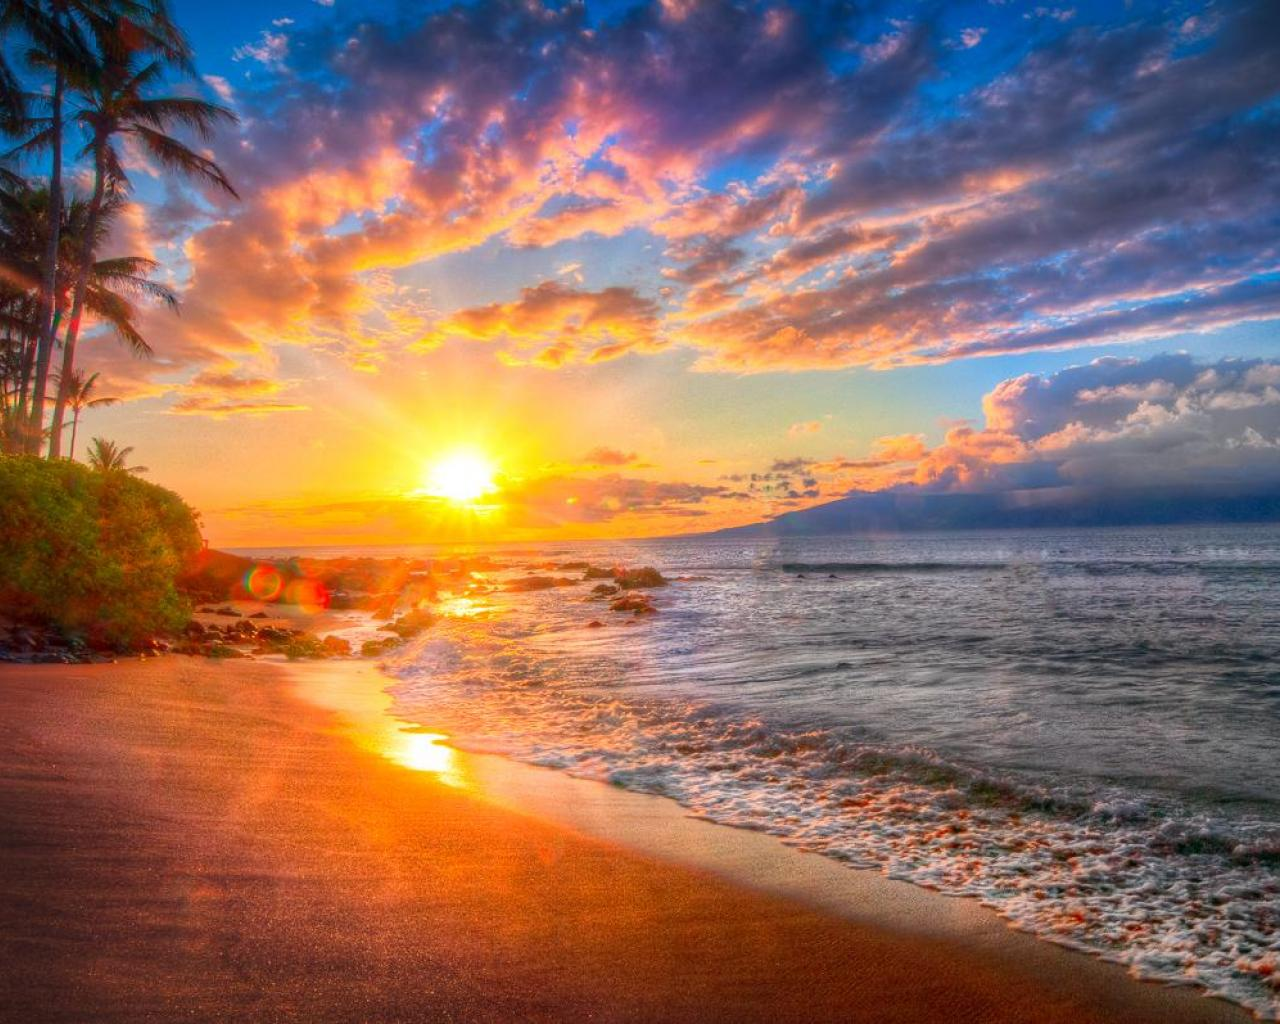 Hawaii Desktop Wallpaper 1280x1024